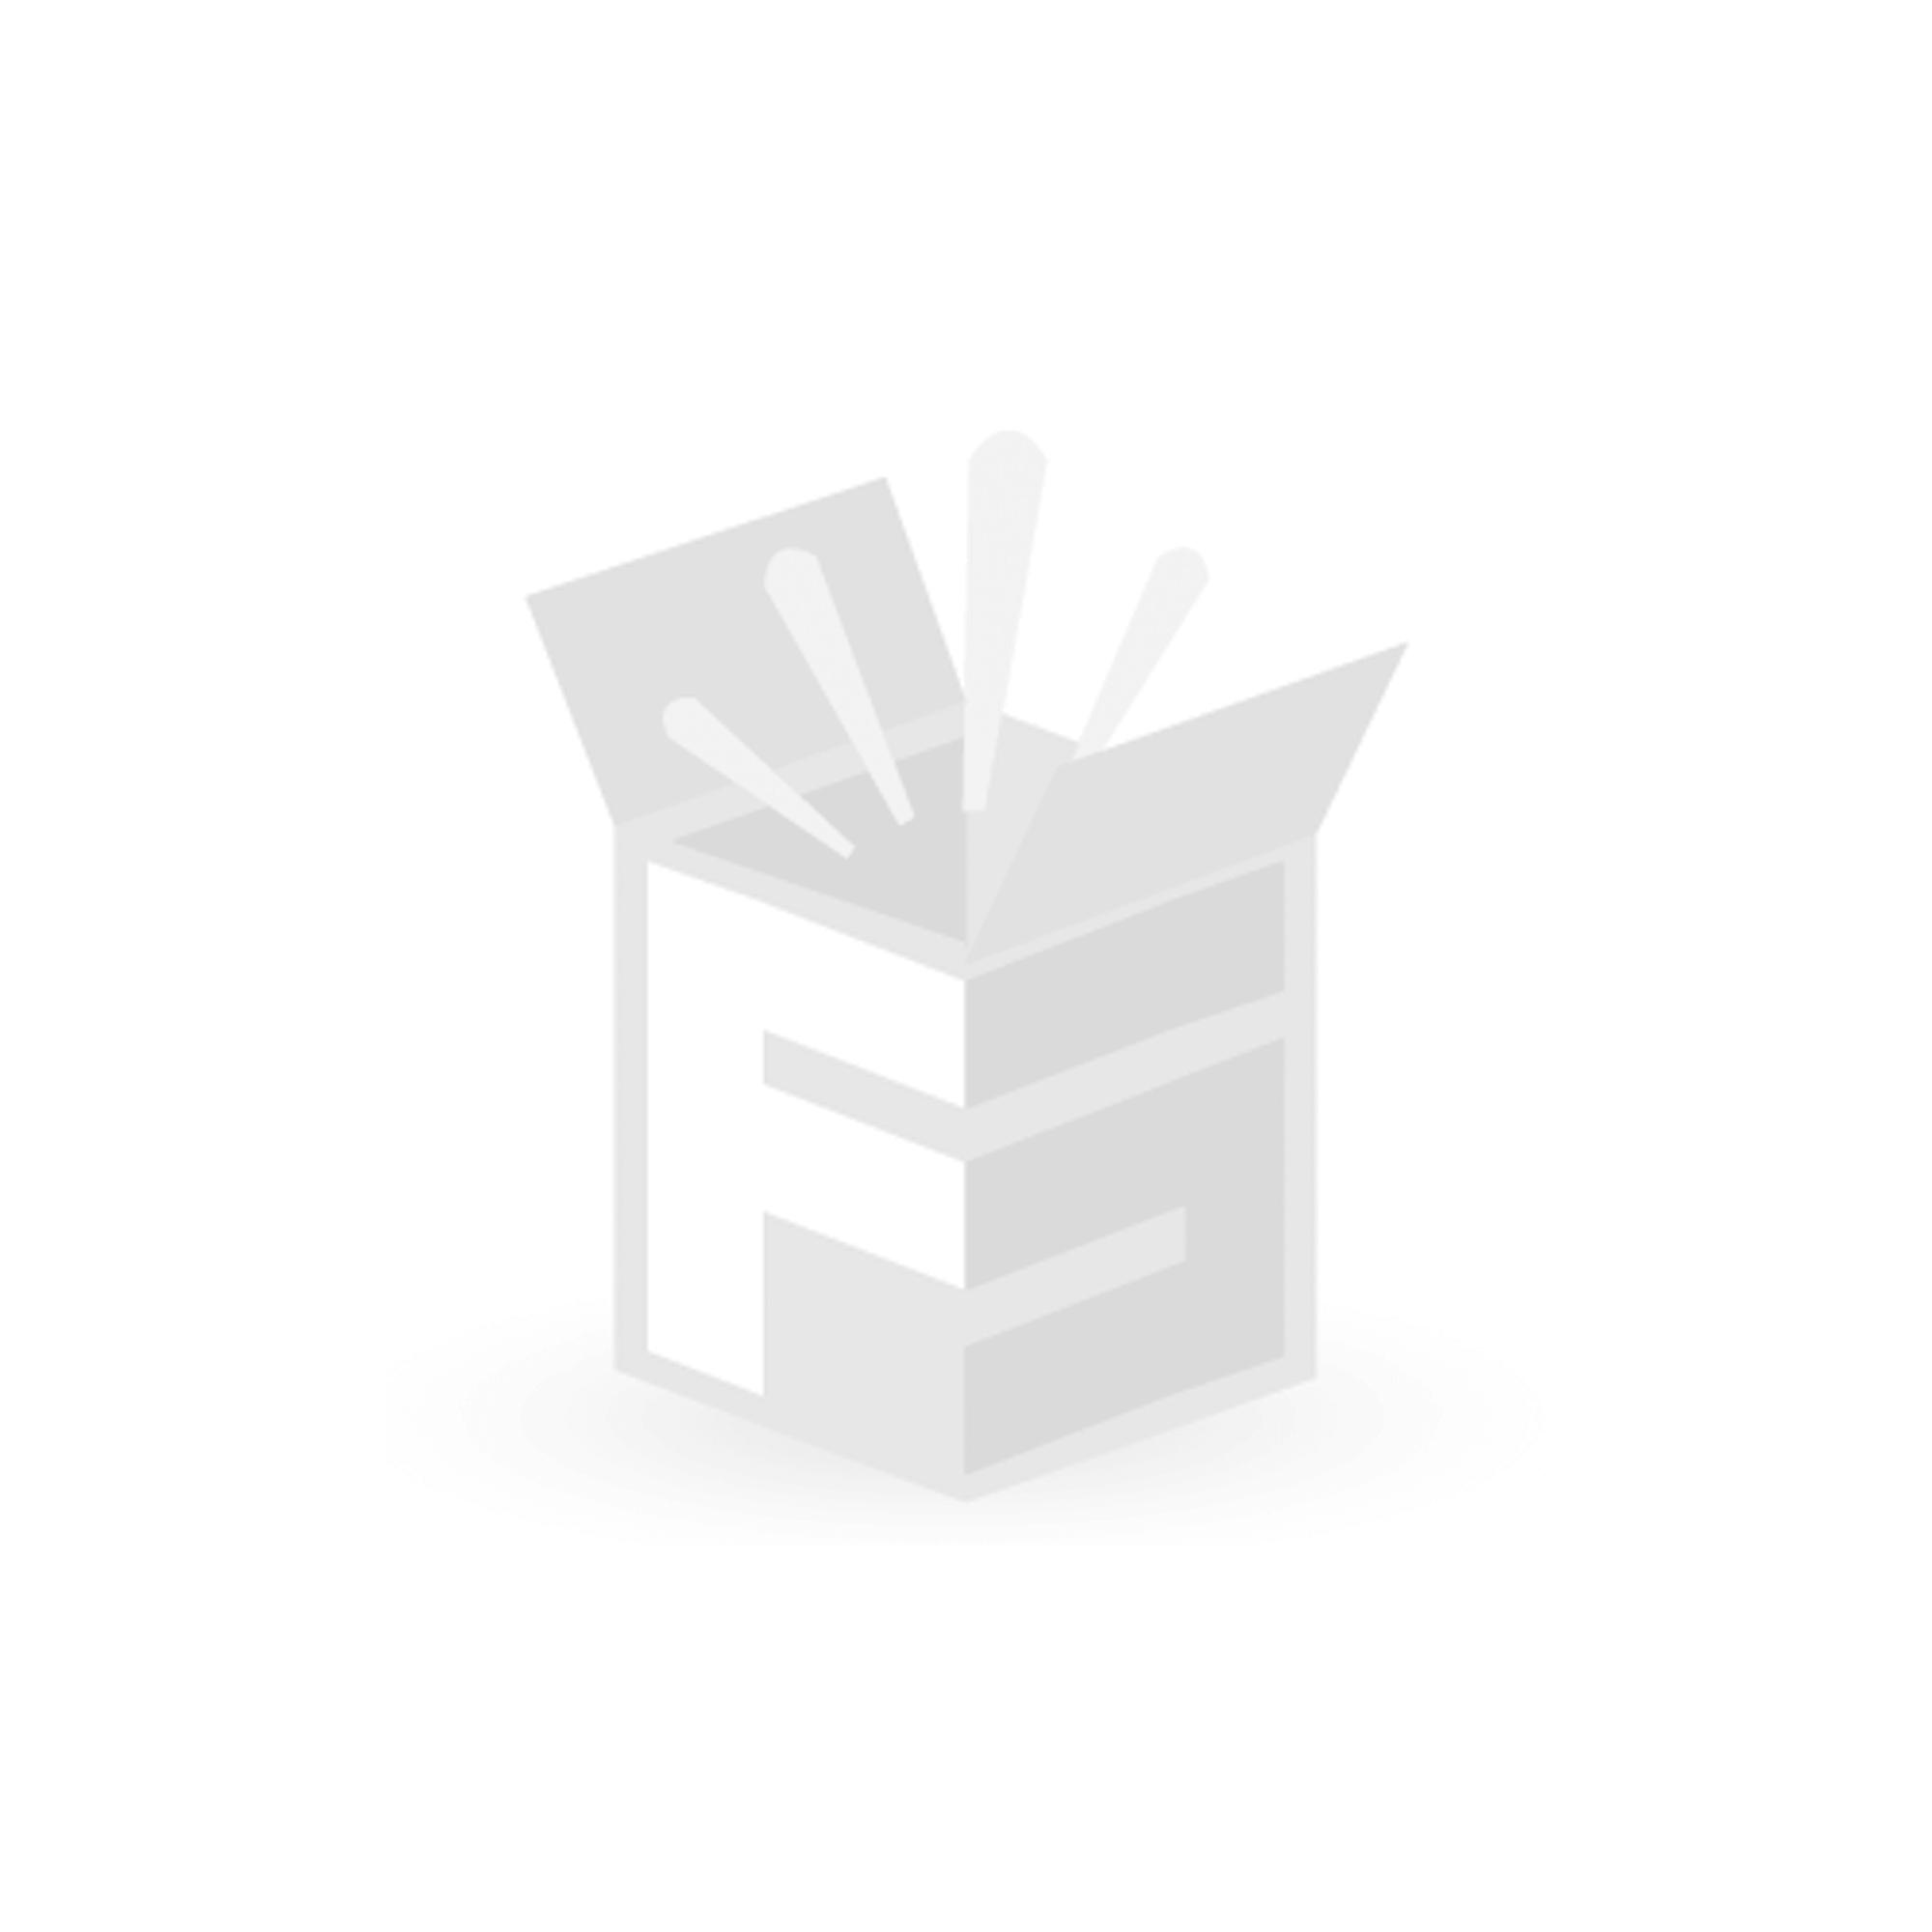 WMF Schnellkochtopf-Set Perfect Plus 2-teilig